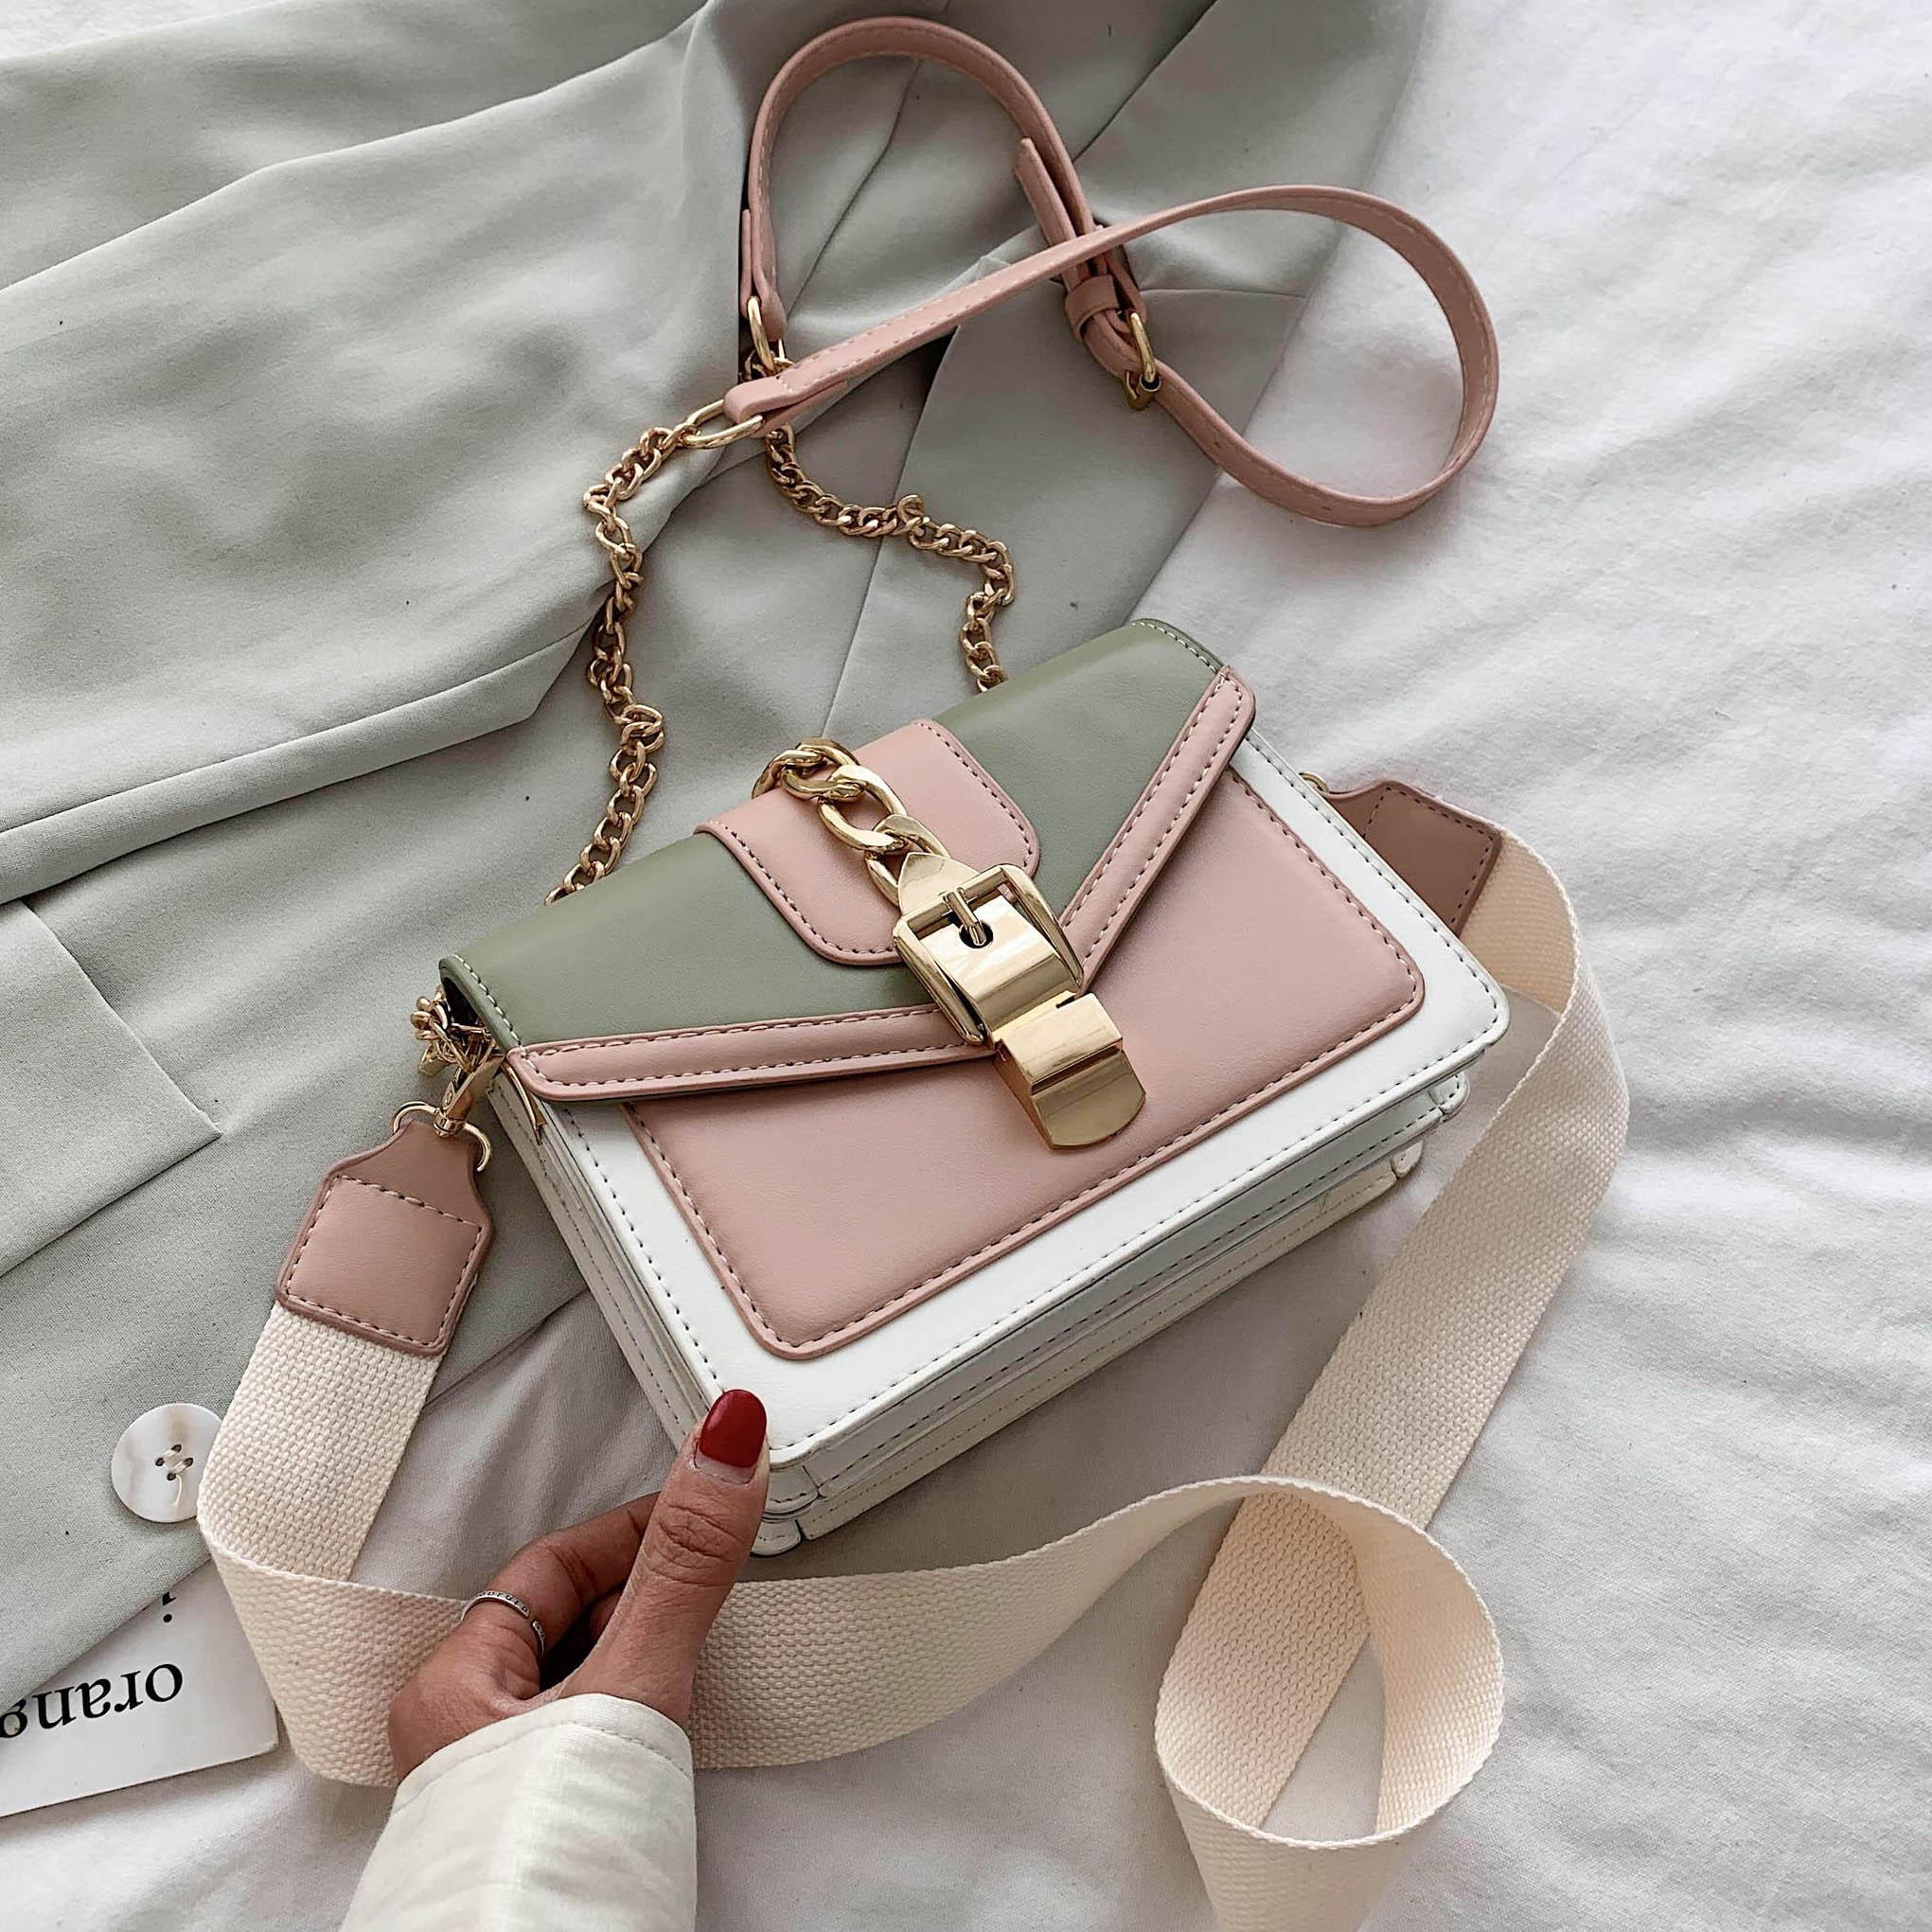 Contrast Color PU Leather Crossbody Bags For Women 2020 Summer Travel Small Handbag Shoulder Messenger Bag Ladies Cross Body Bag